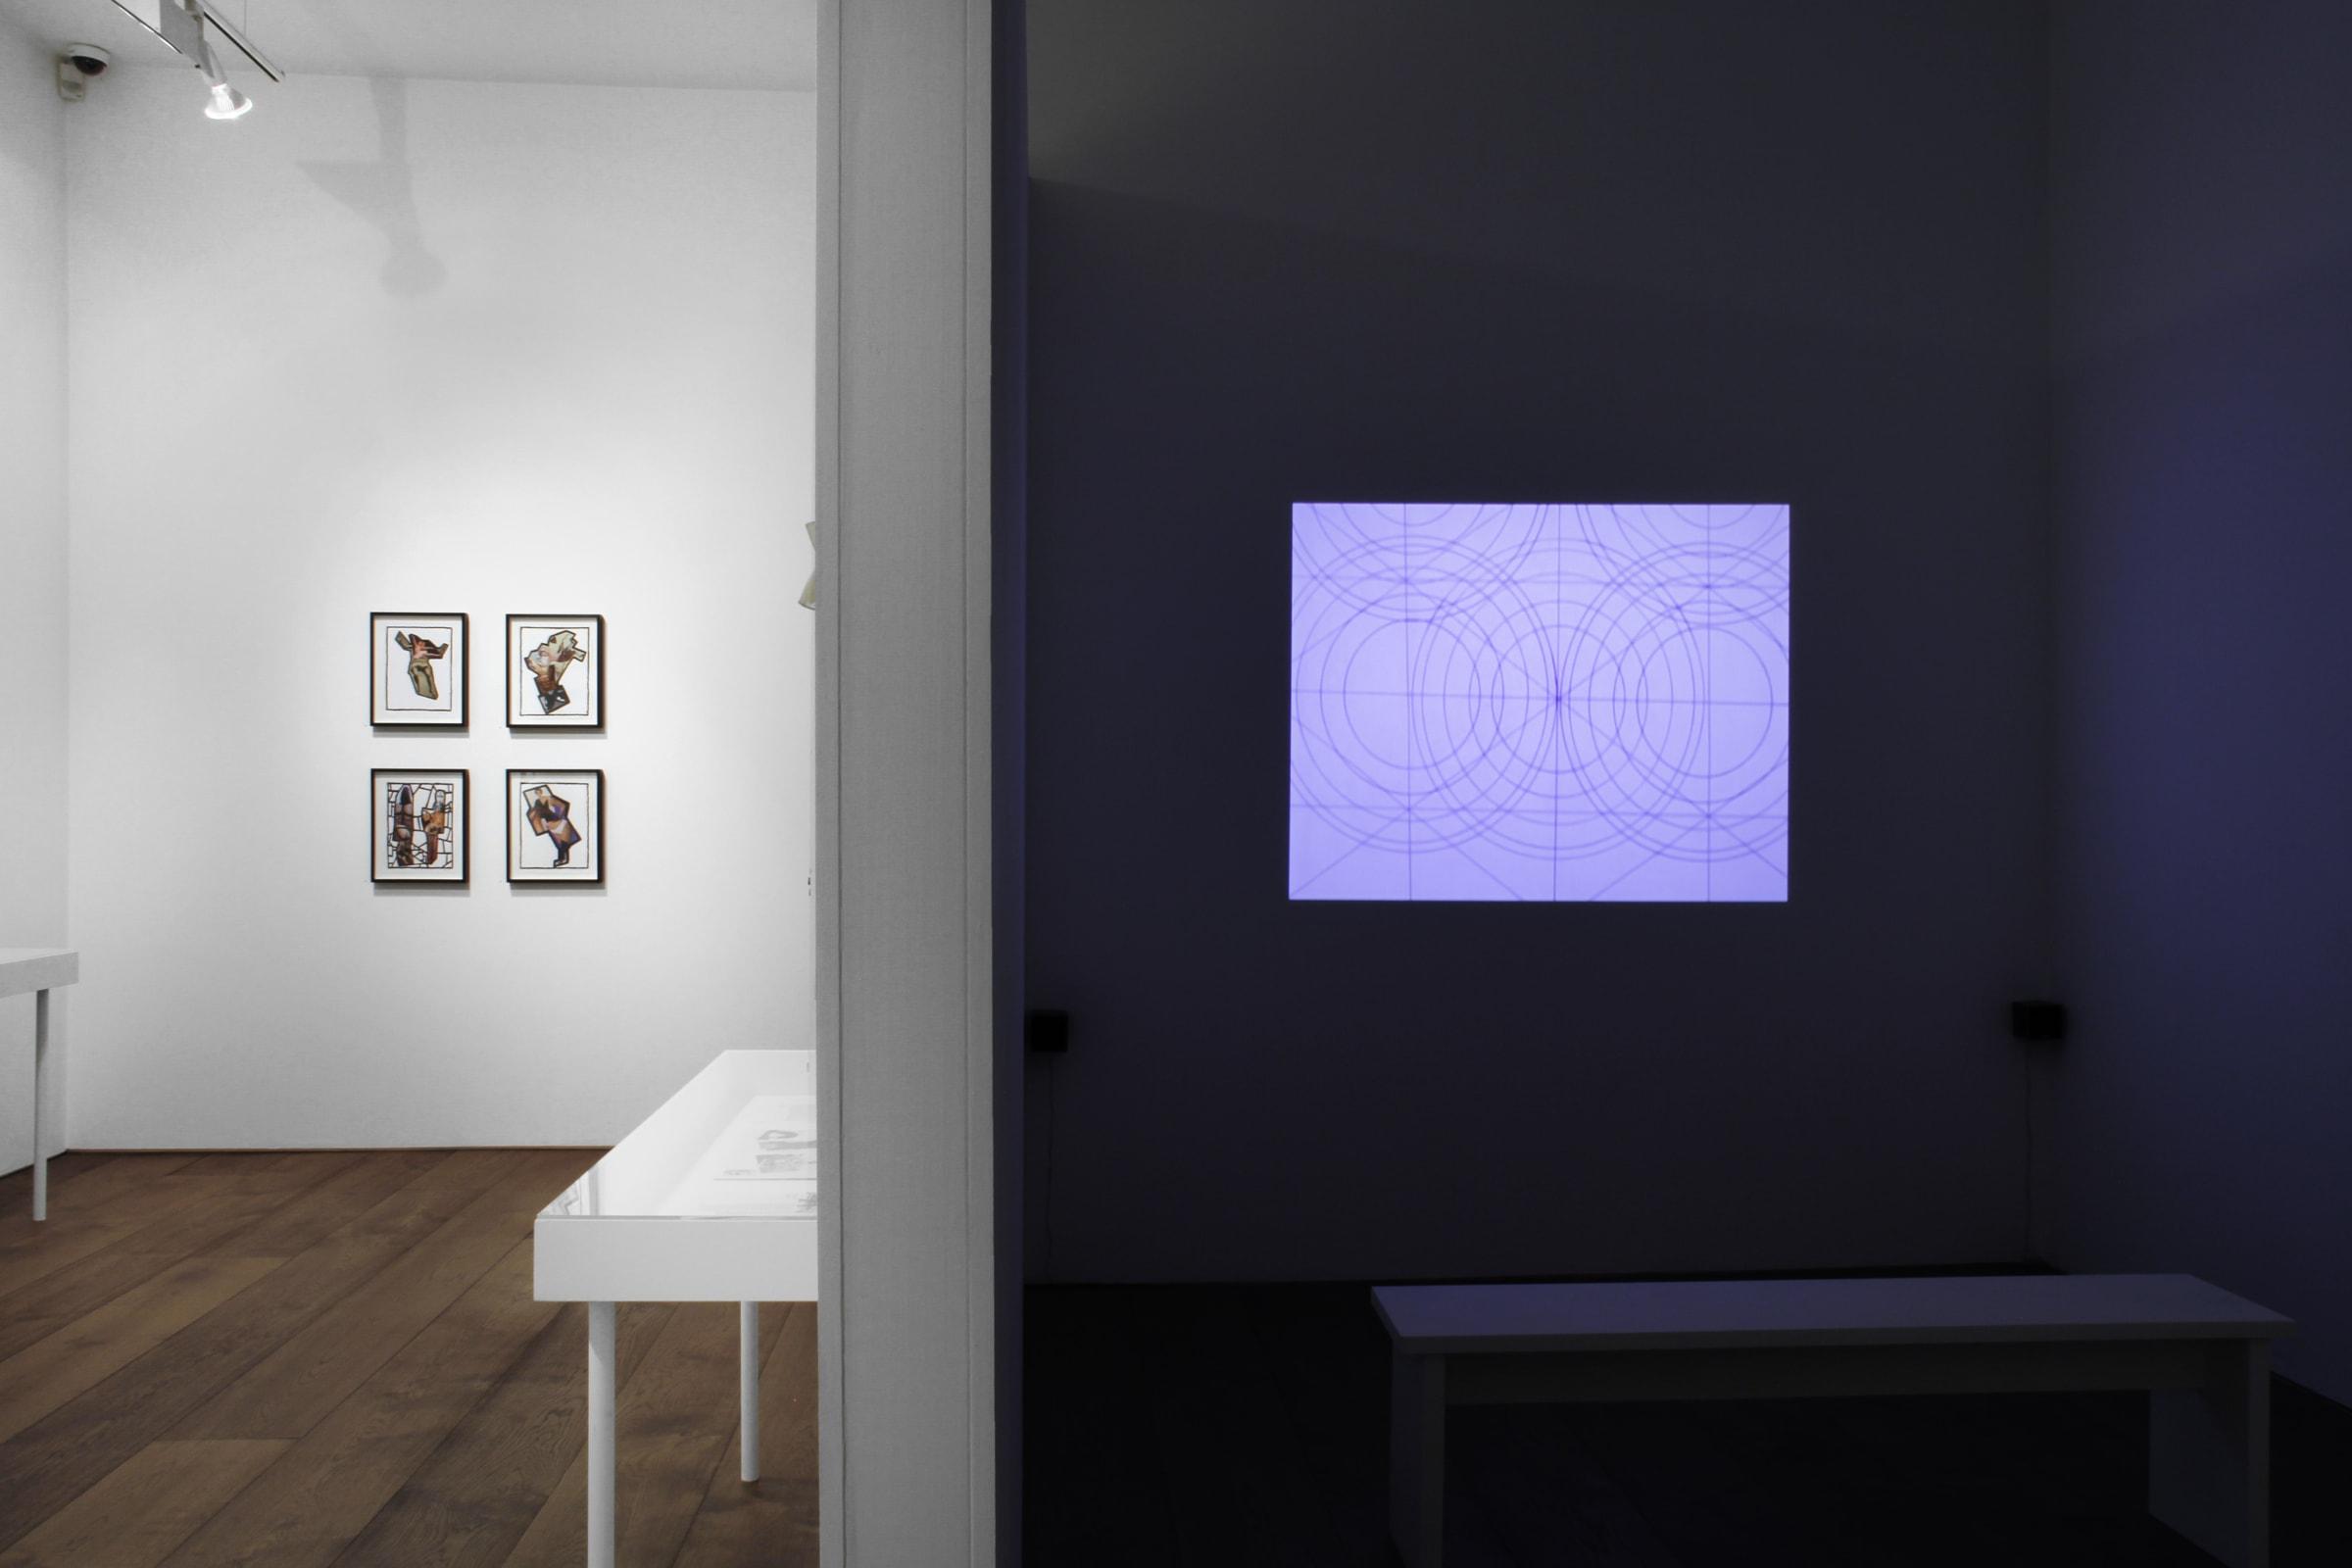 Derek Boshier Rethink / Re-entry